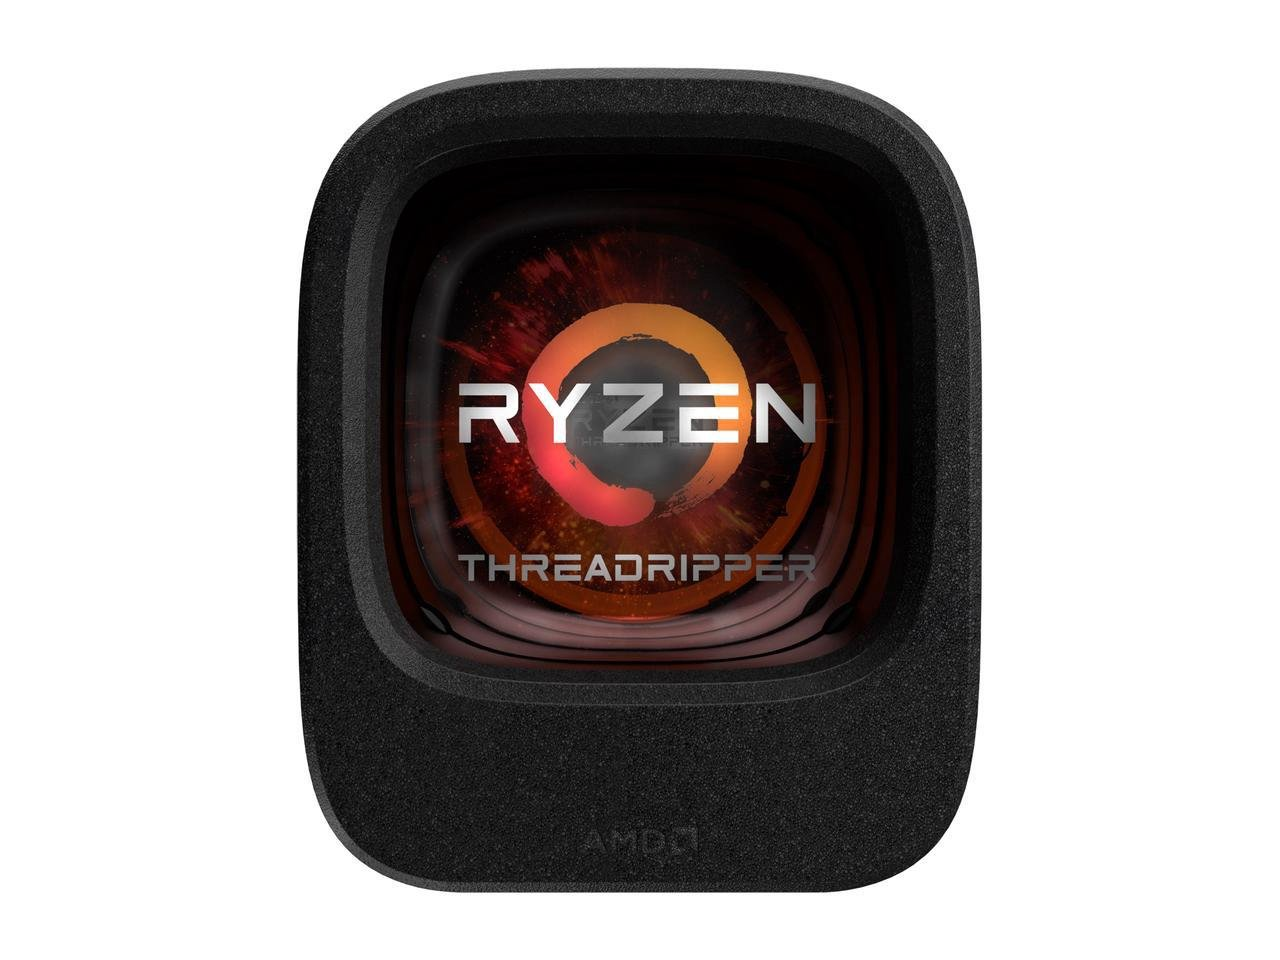 ADAMANT 16X-Core Workstation Desktop Computer AMD RYZEN Threadripper 1950X 3.4Ghz 32Gb DDR4 4TB HDD 500Gb SSD 750W PSU  3Year Warranty & Lifetime Tech Support 